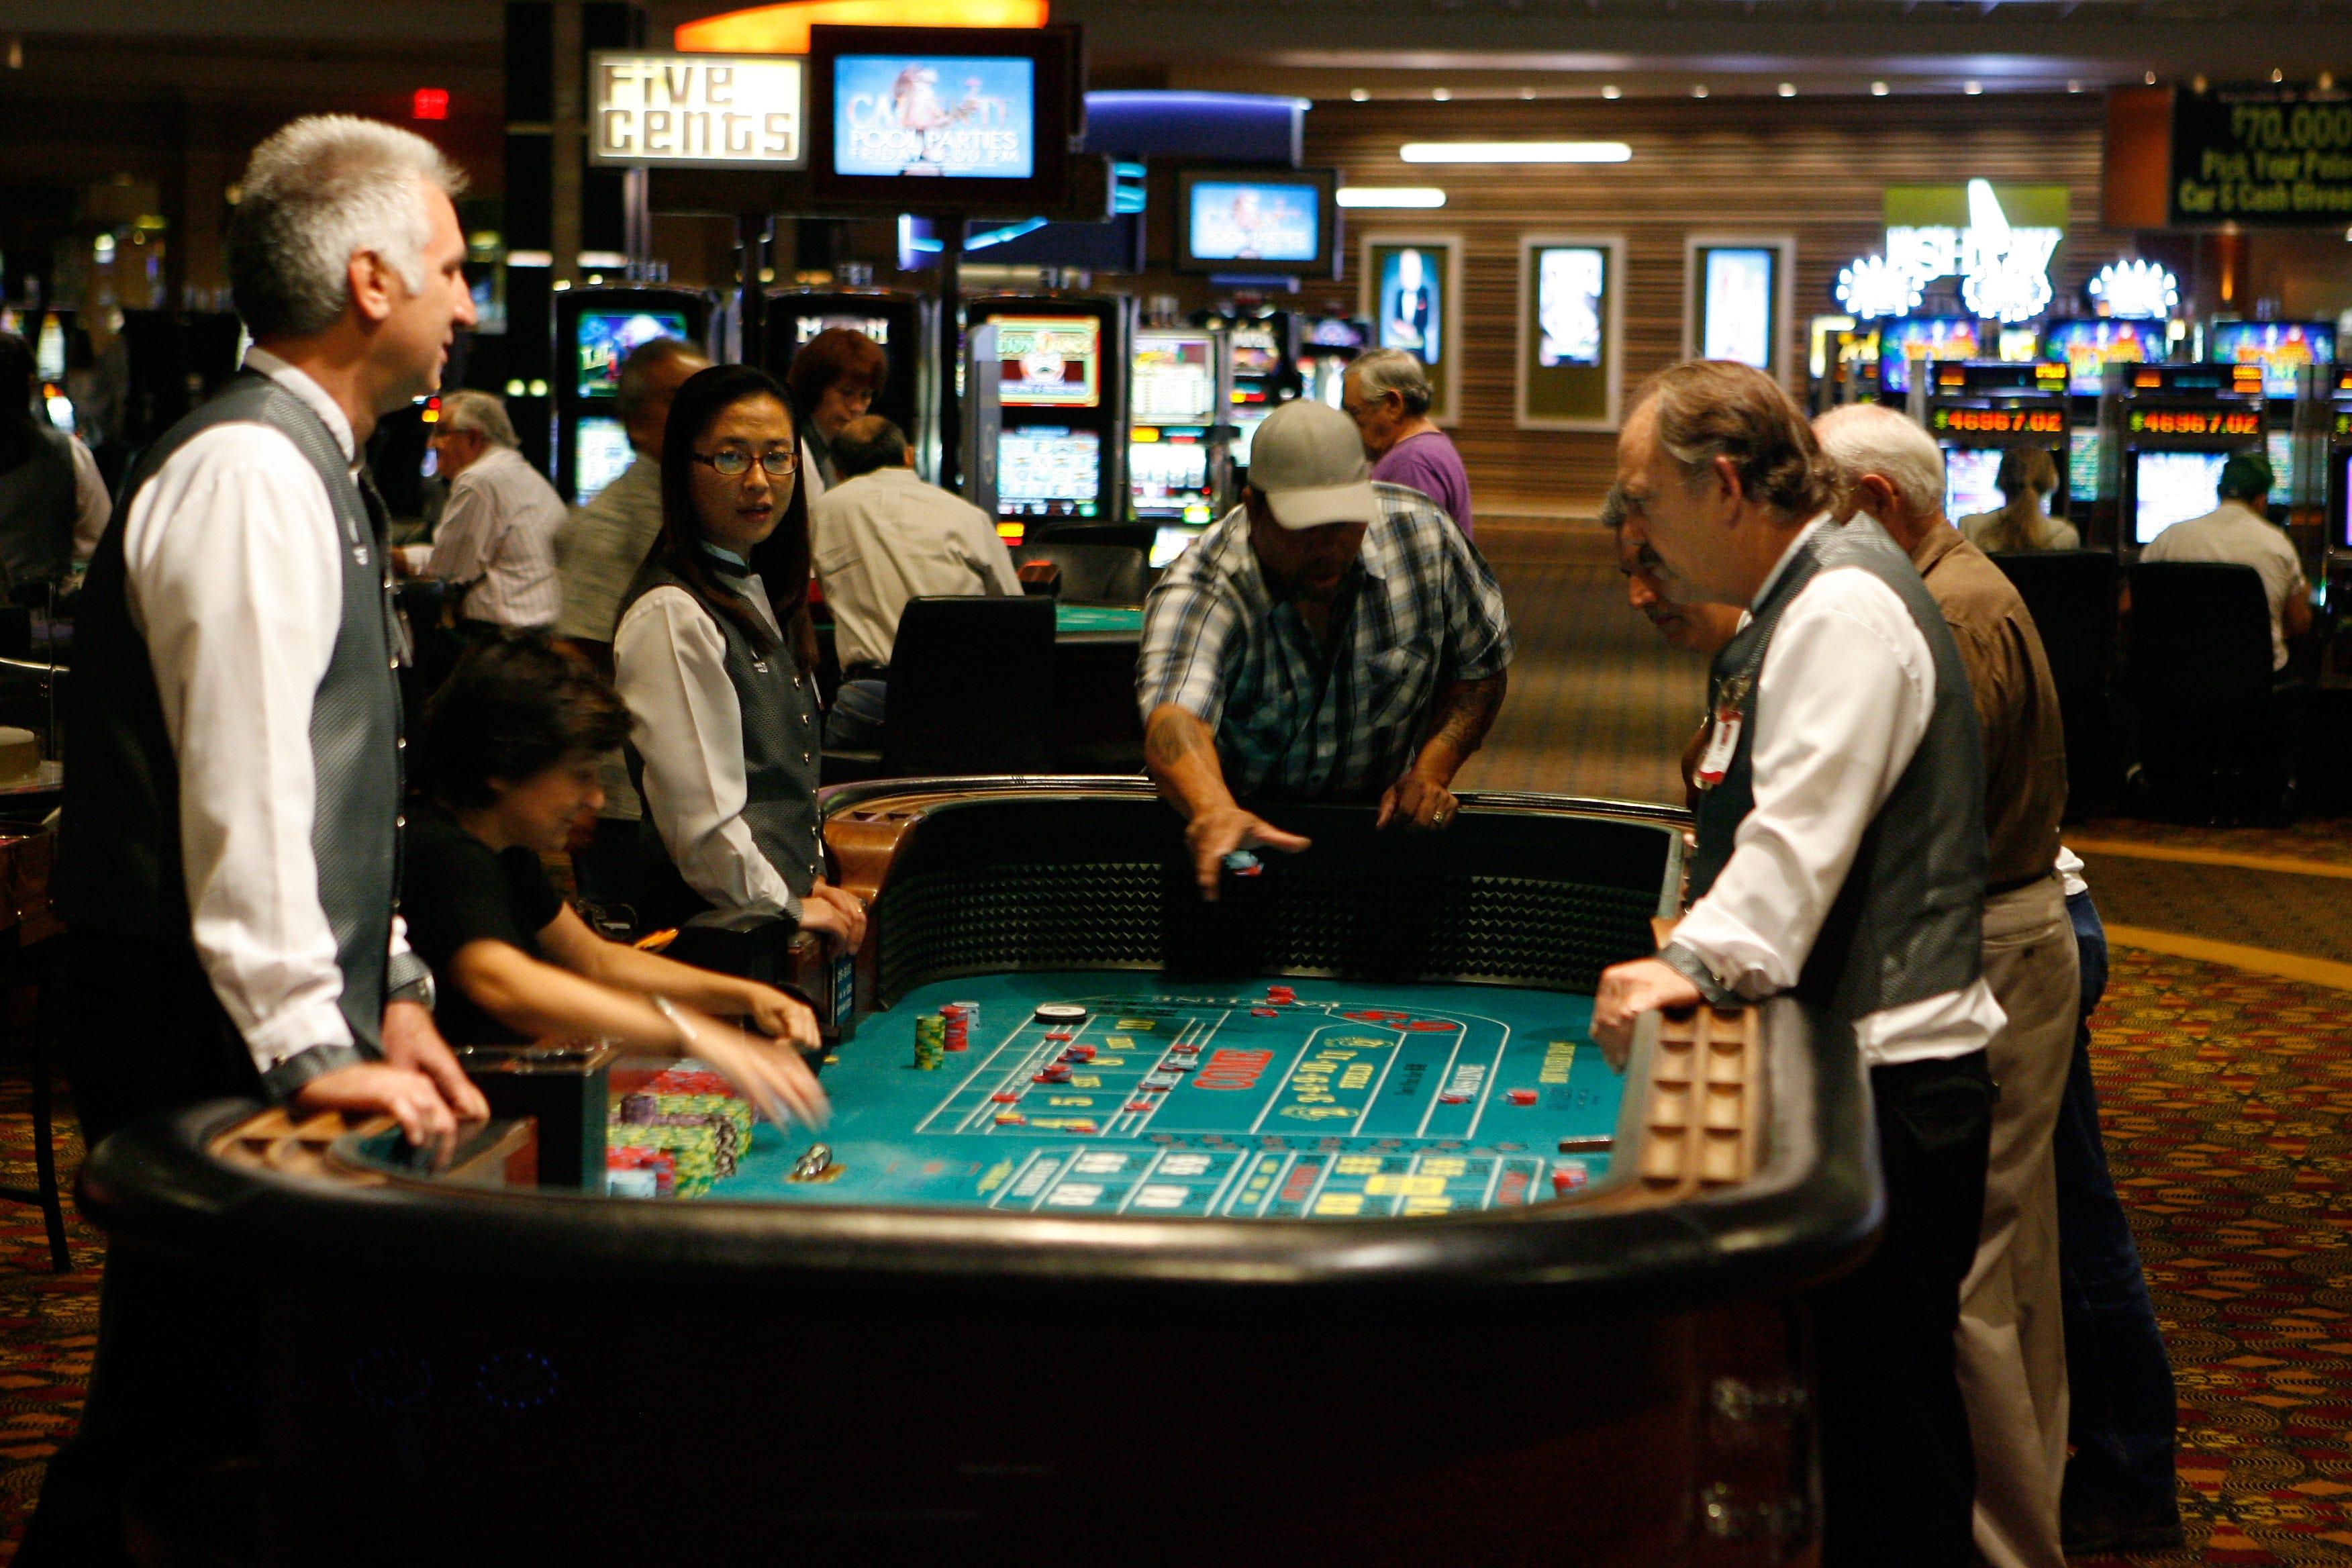 Palm springs gambling procter and gamble boston ma